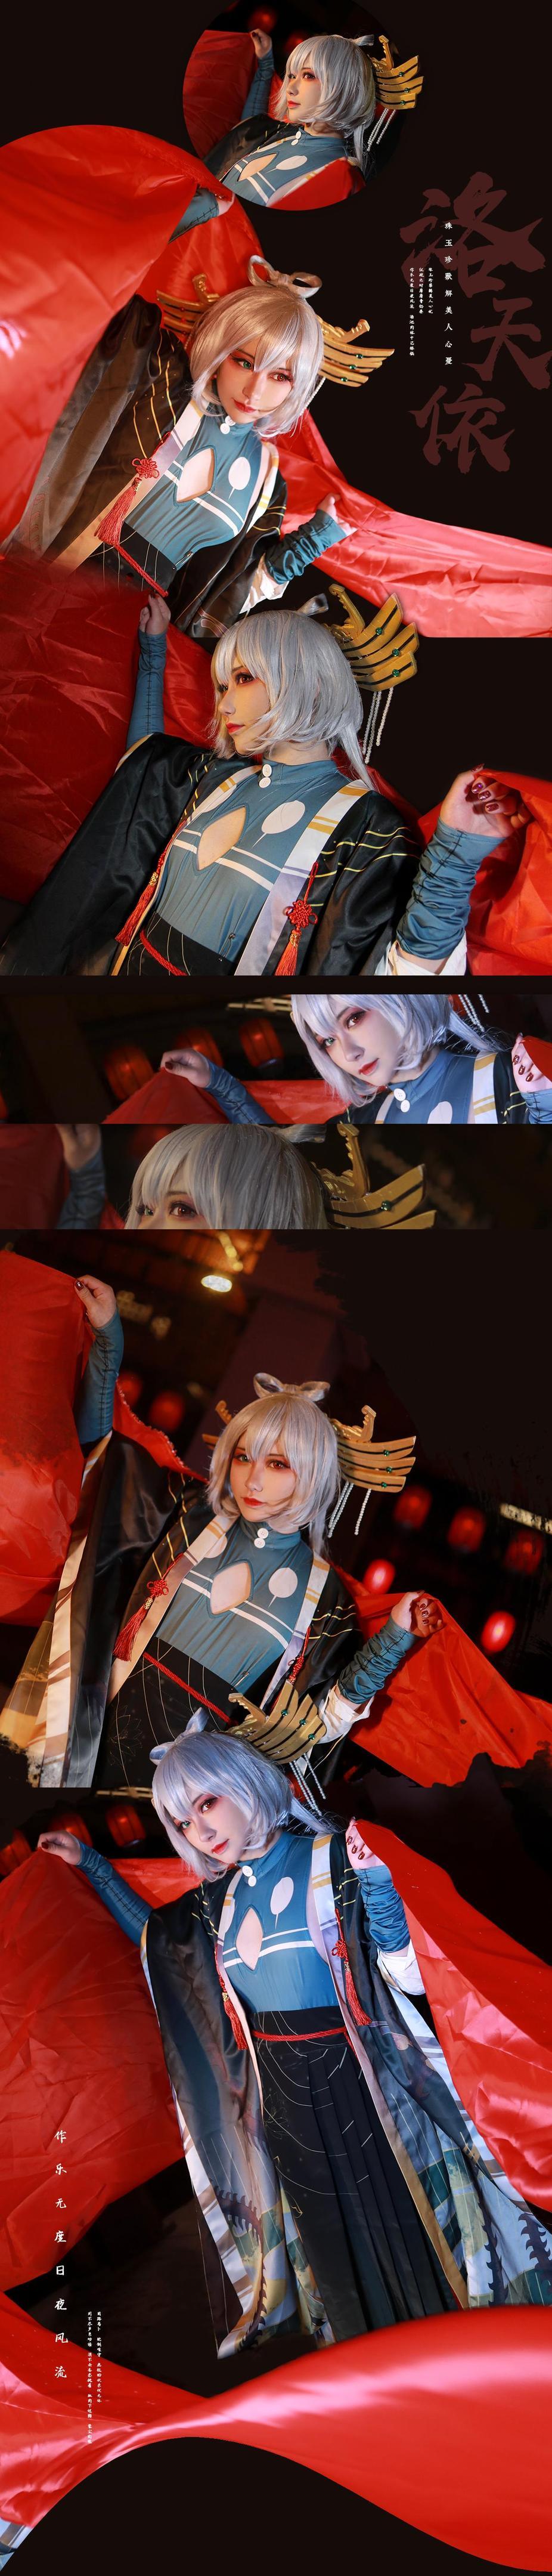 《VOCALOID》正片cosplay【CN:时雨-Jiu】-第4张